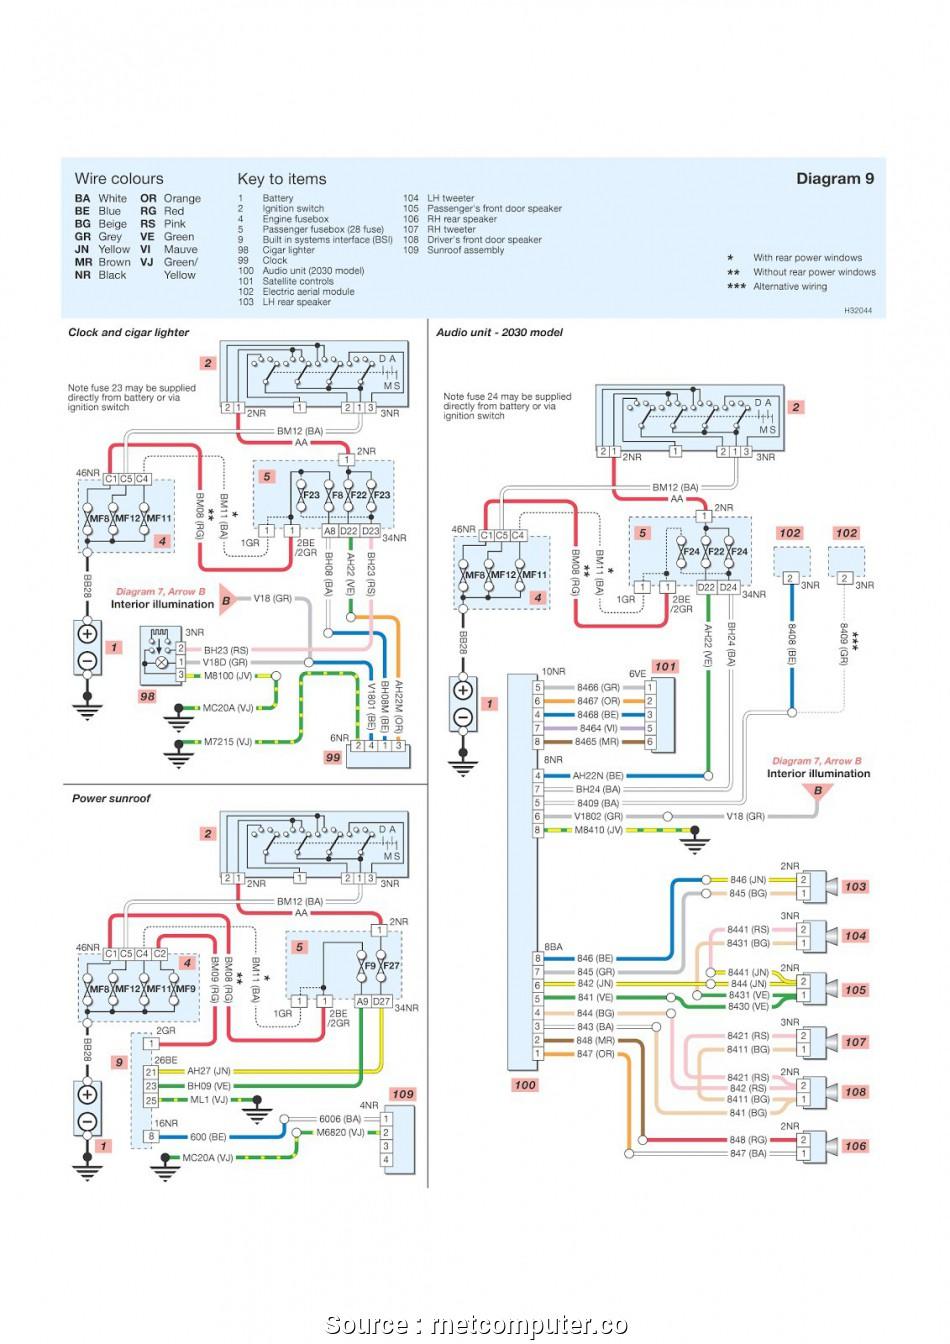 Amazing Peugeot 307 Light Wiring Diagram Wiring Library Wiring Cloud Mousmenurrecoveryedborg